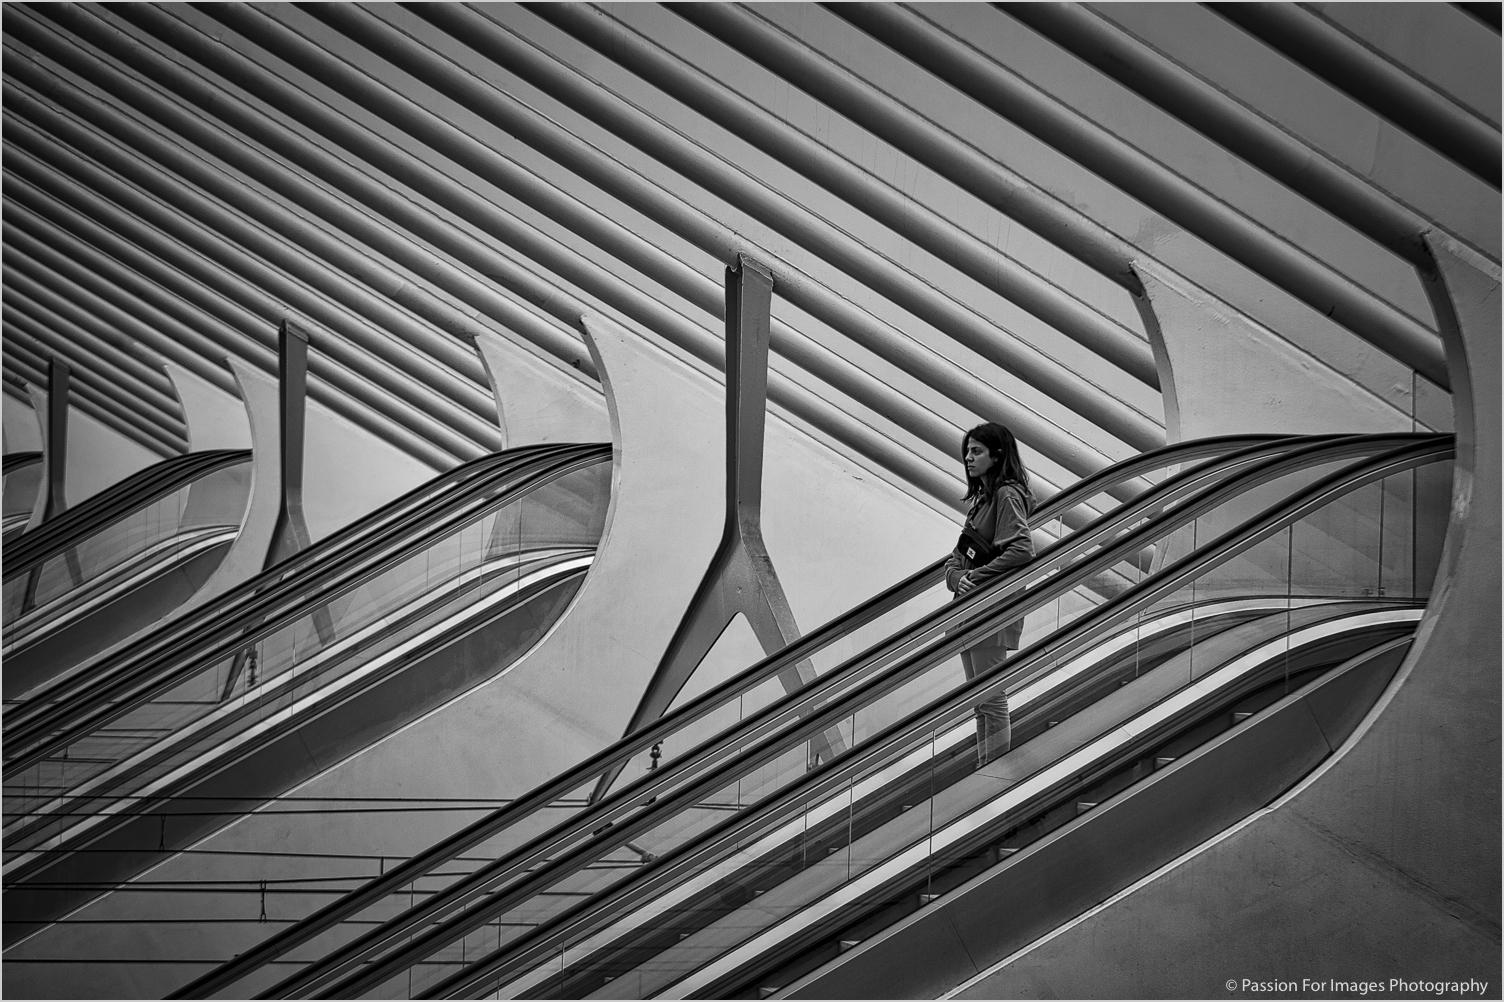 _D7C1391_2019_06_Belgien-Edit-2-Edit-2-Print-Full-JPEG.jpg